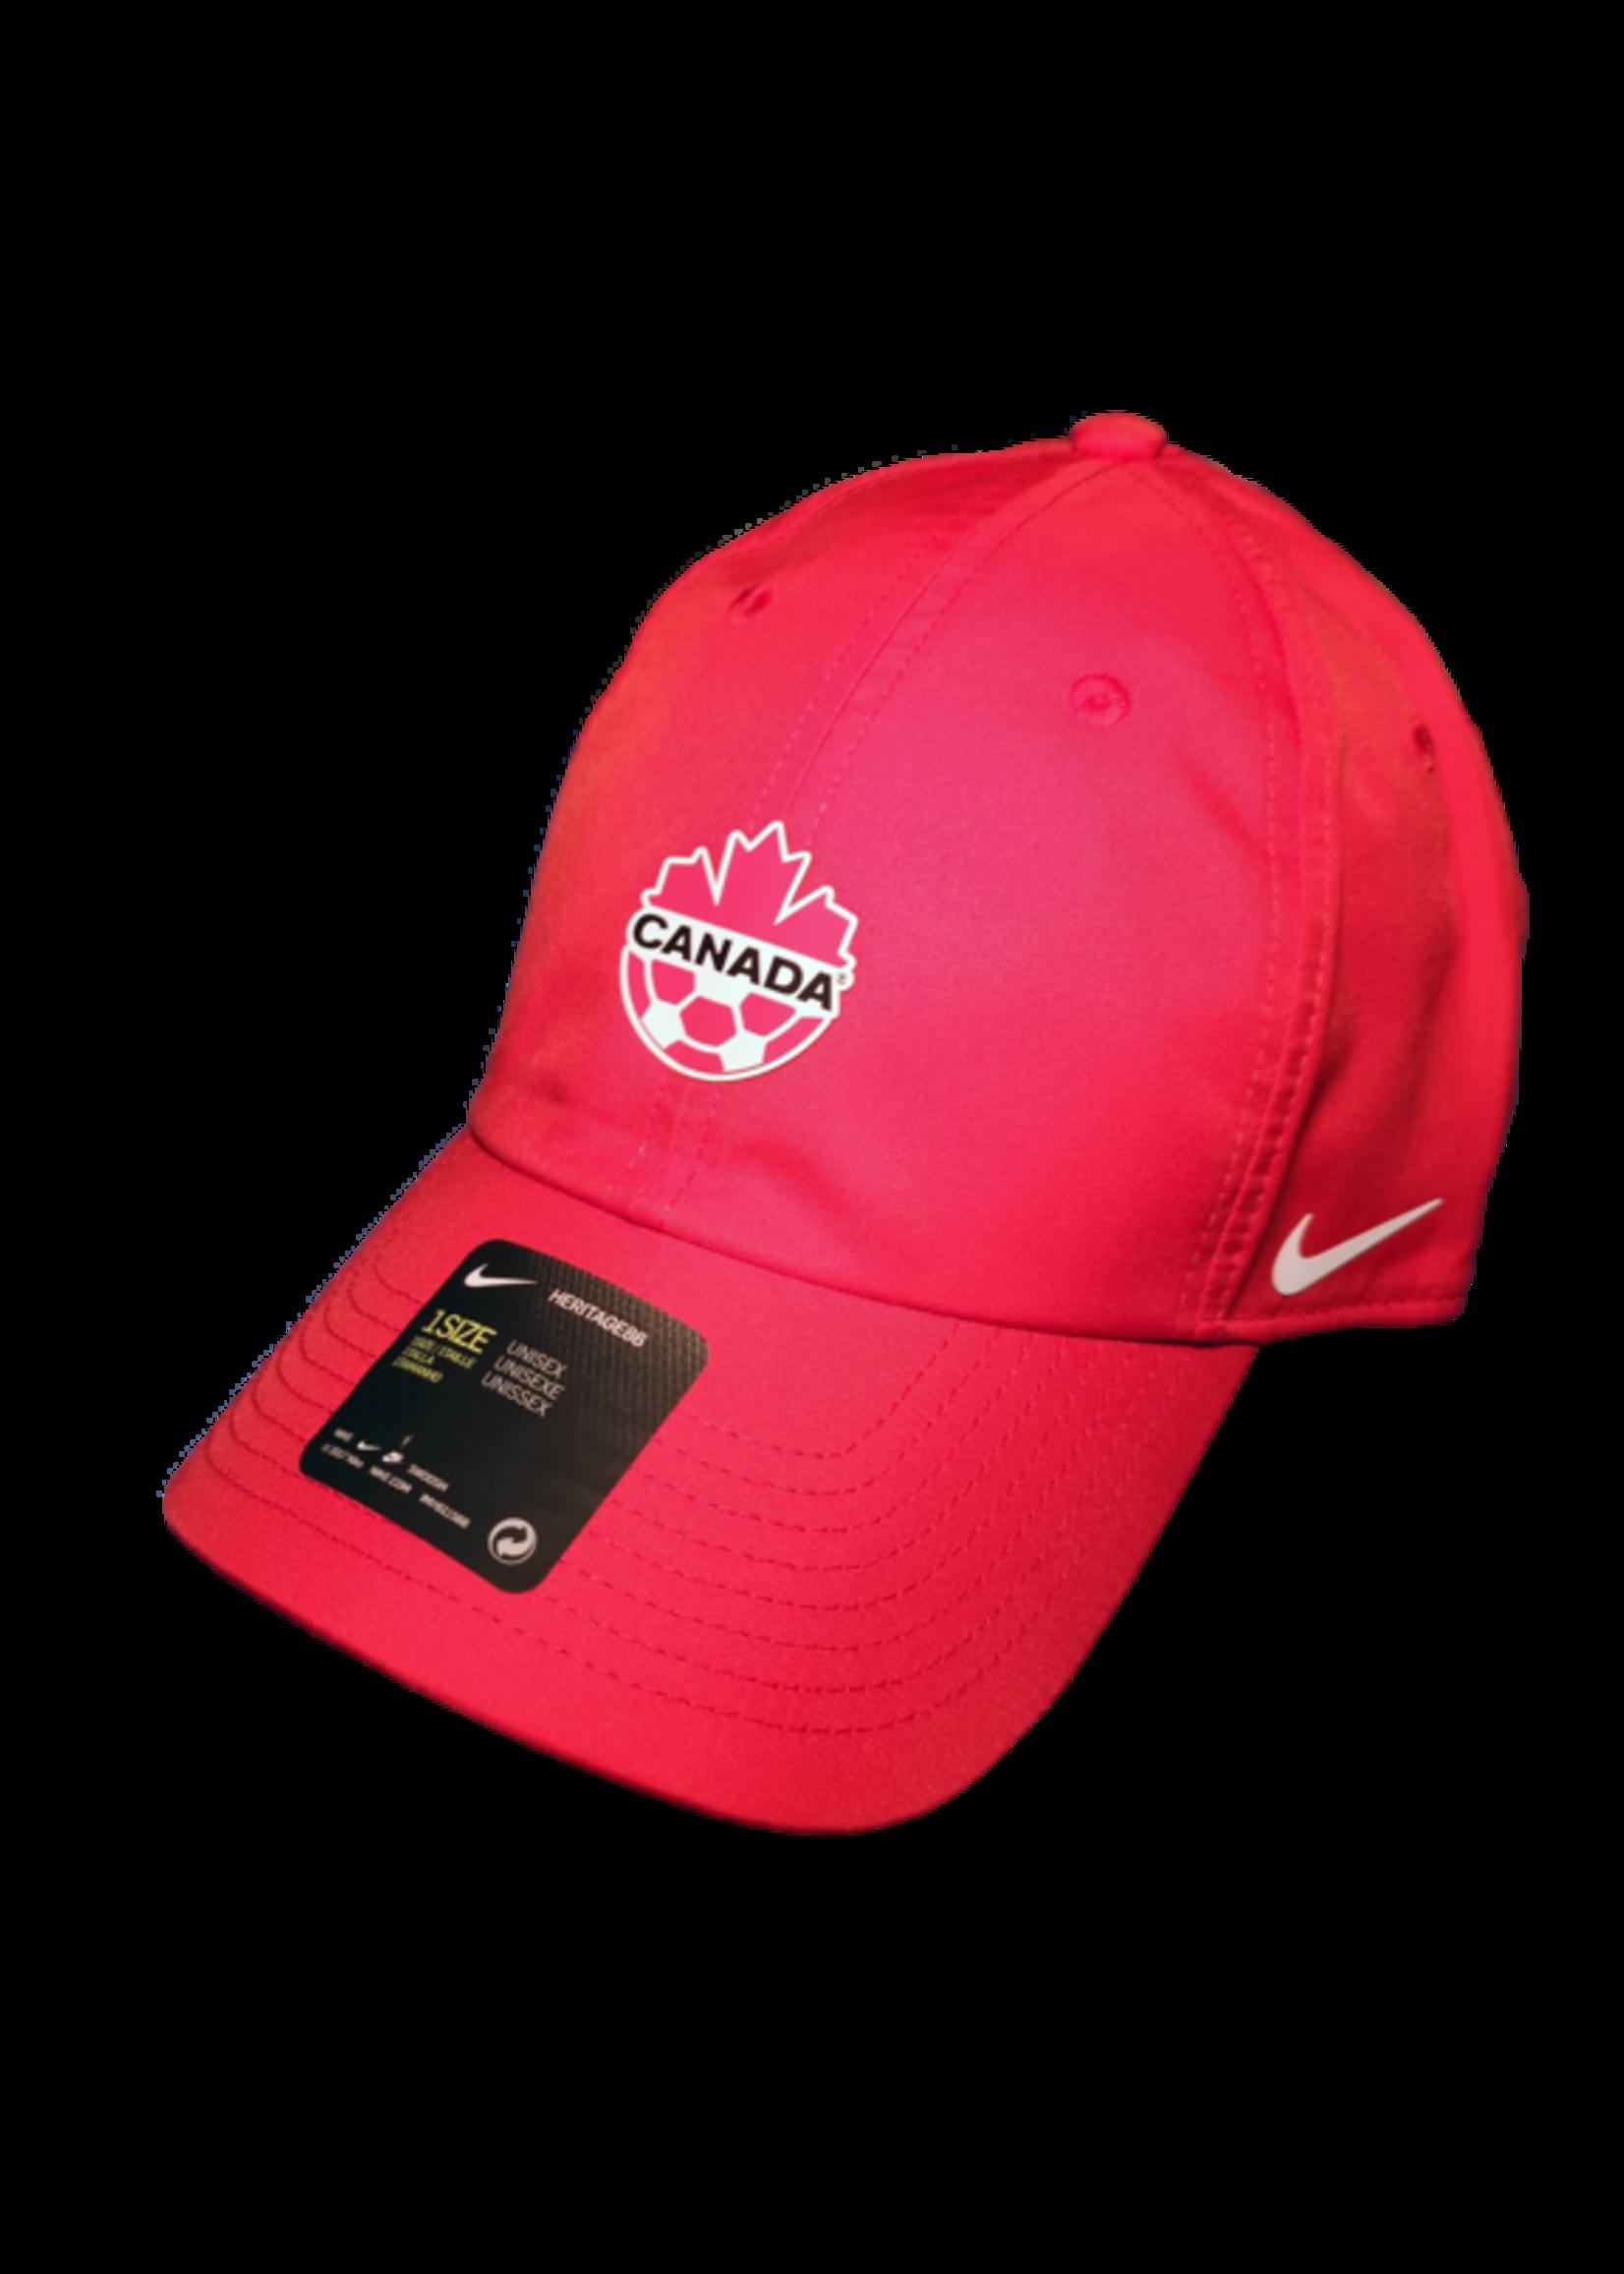 Nike Canada Cap - Red Athletic